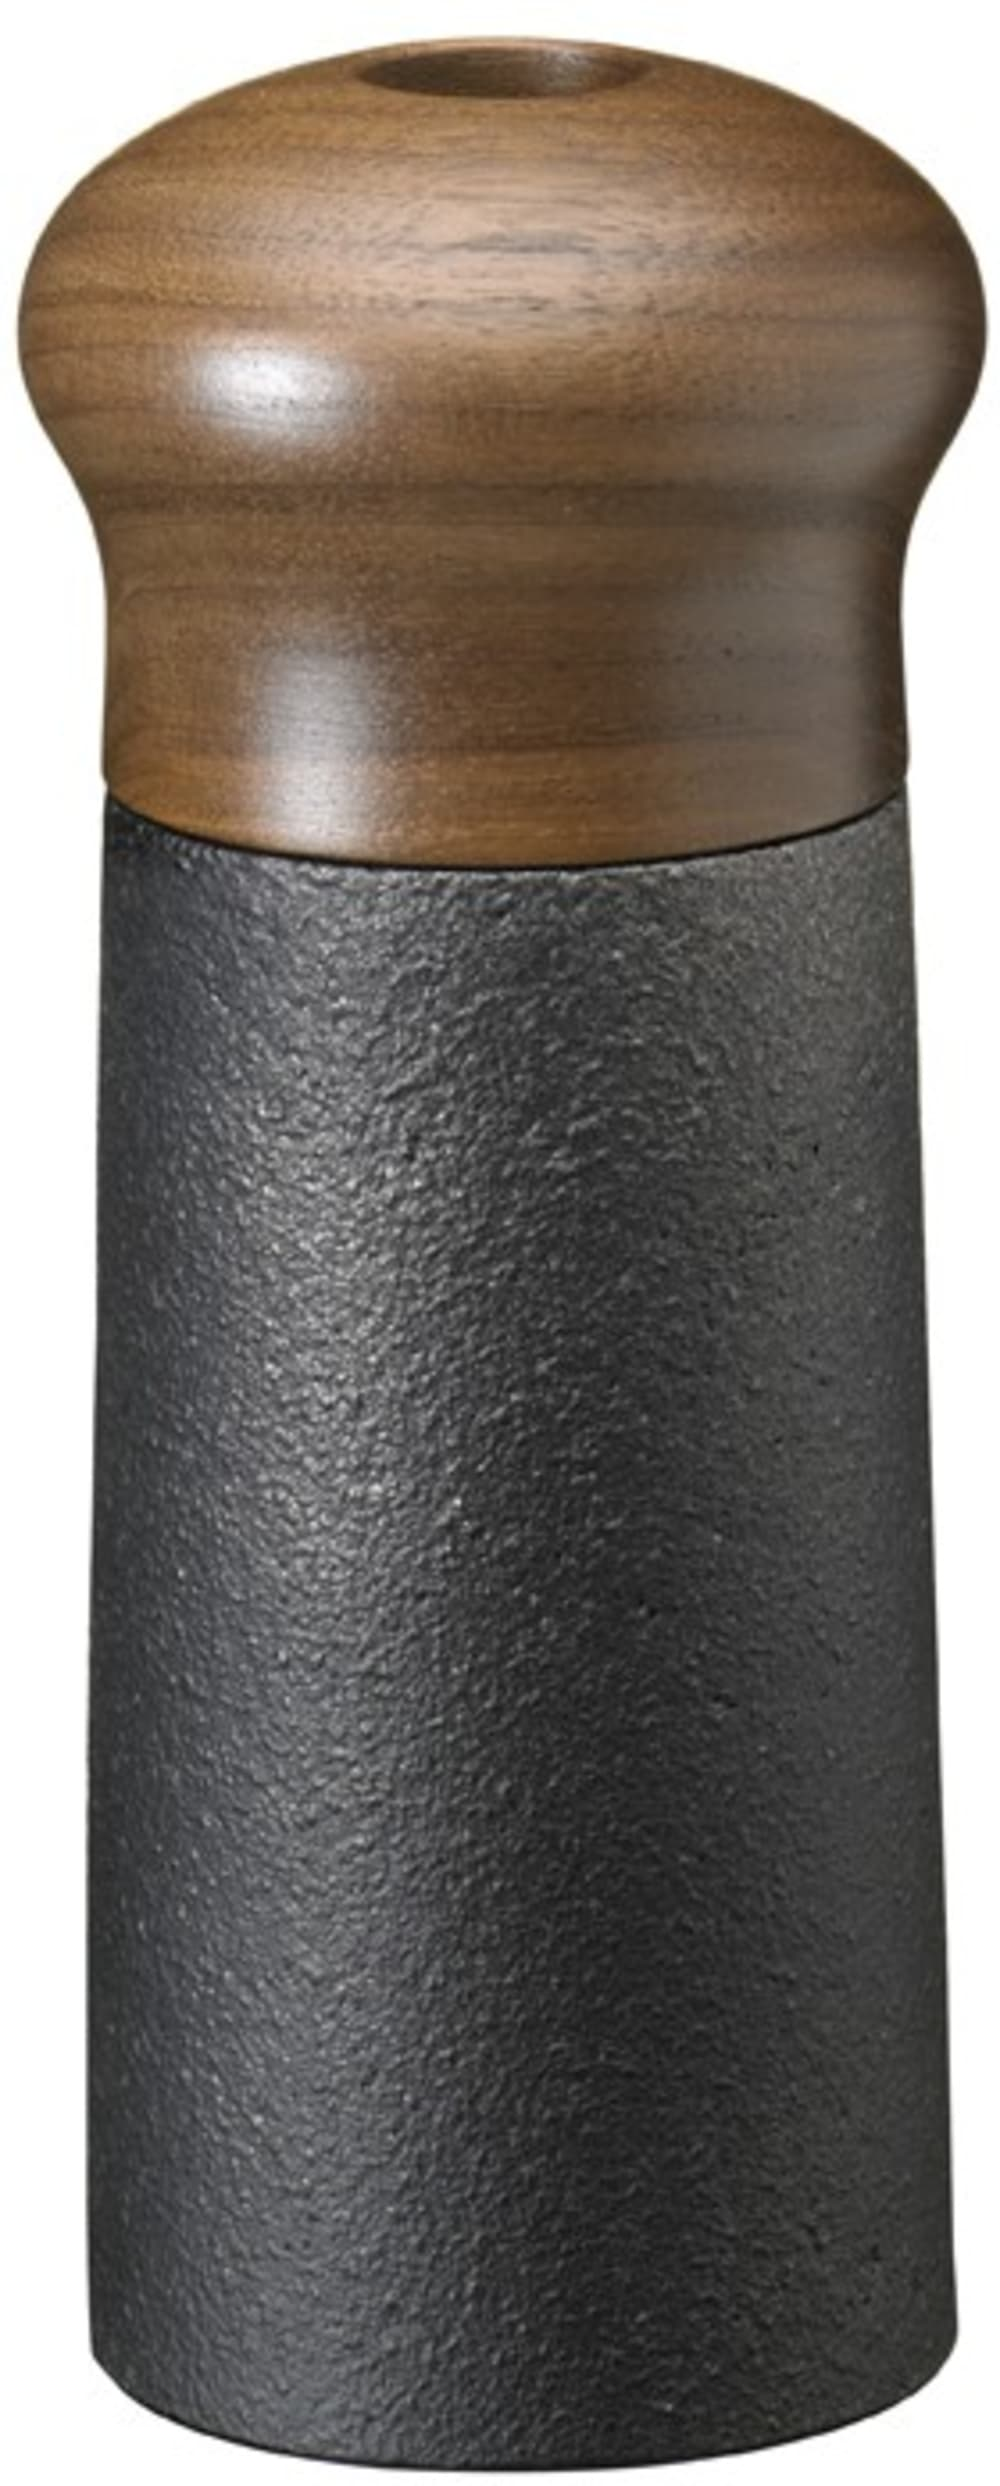 Pojemnik na sól morską WALNUT